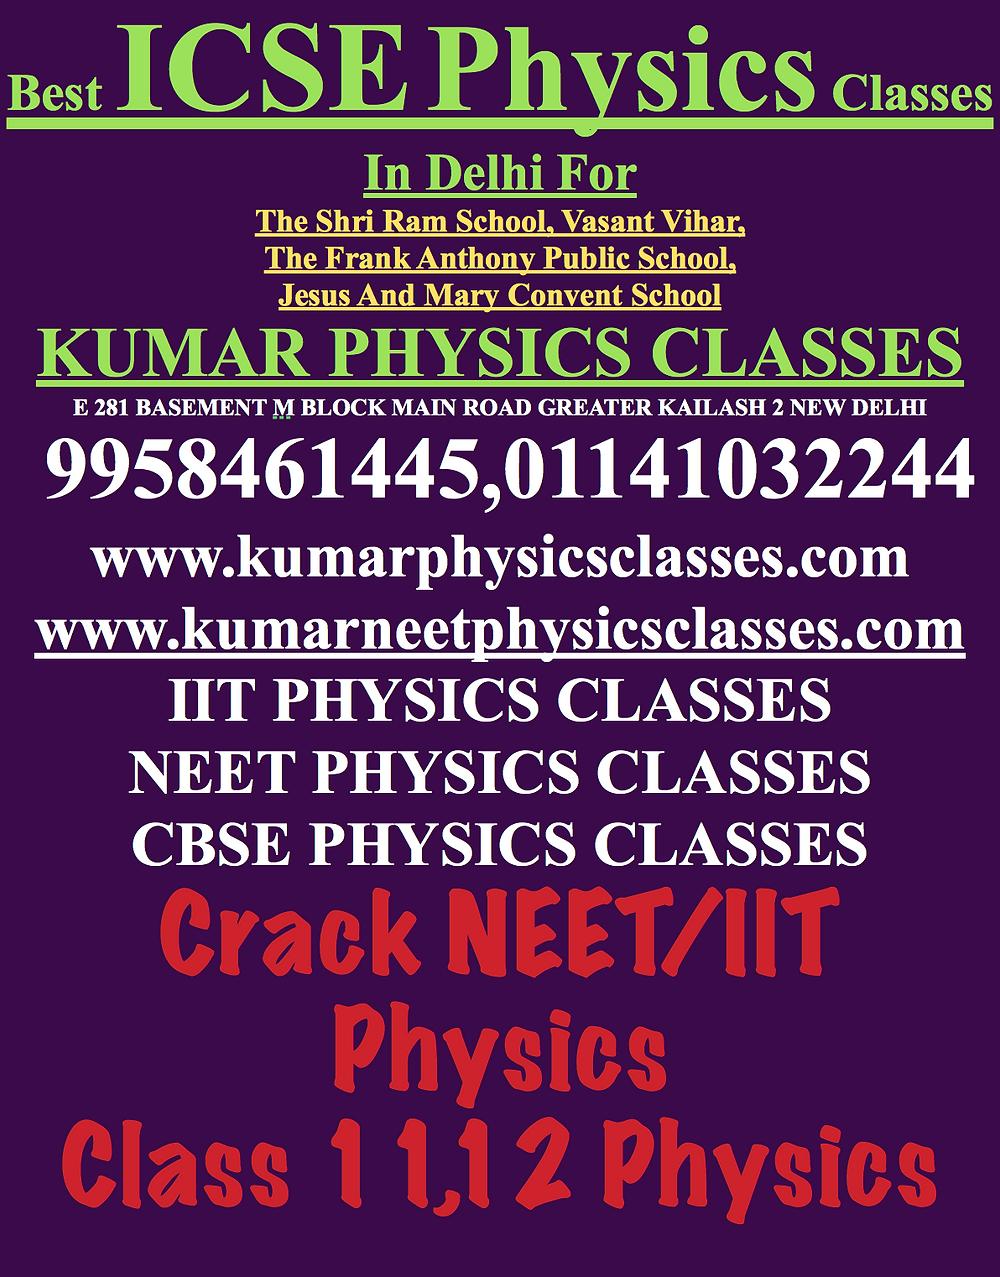 kumar Physics Classes For ICSE BOARD PHYISCS